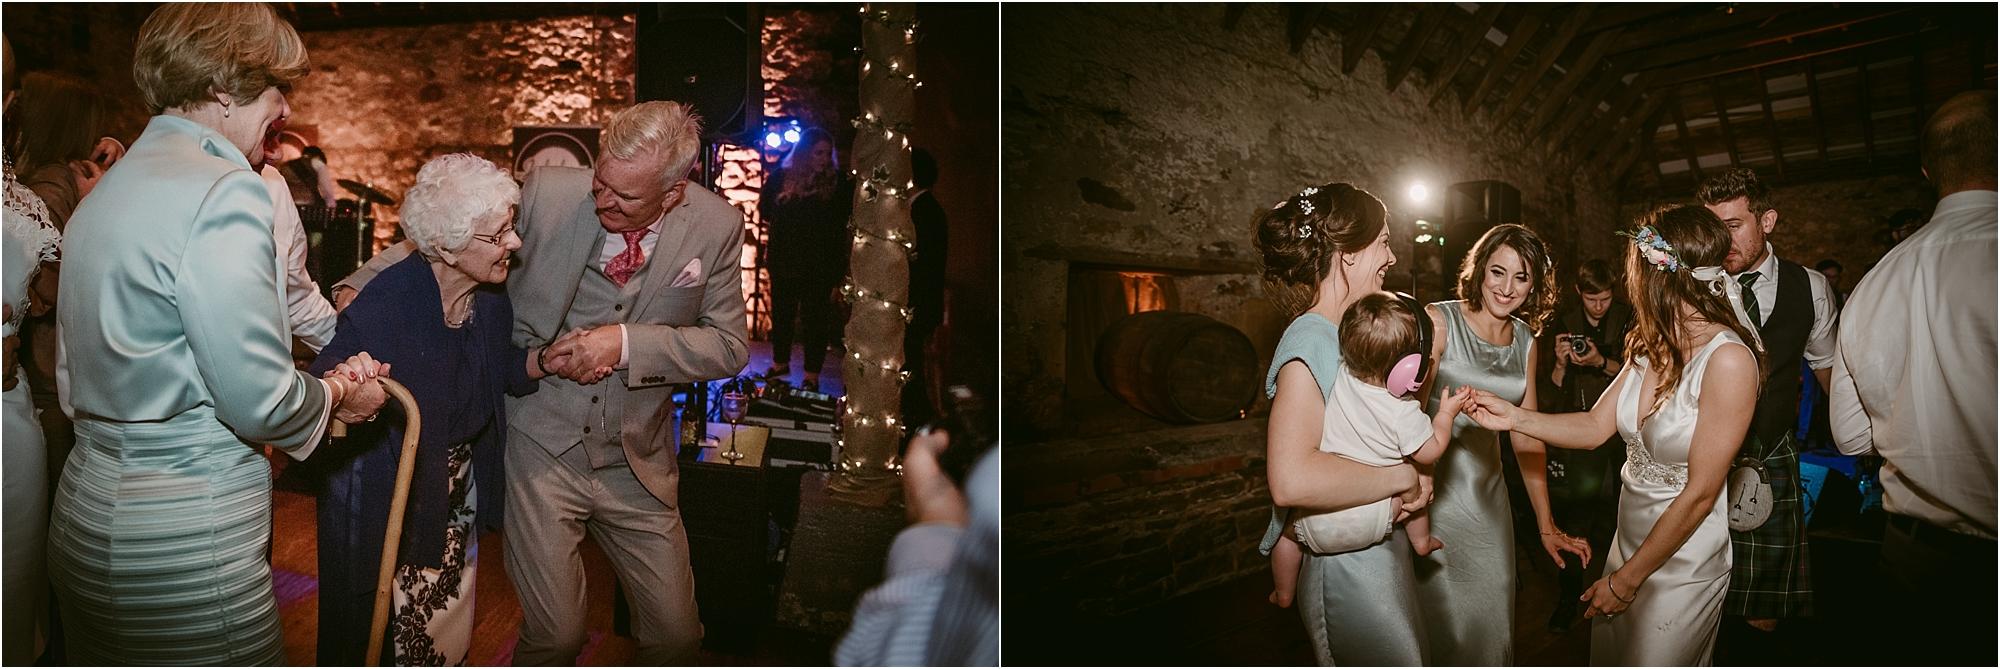 Scott+Joanna-Kinkell-Byre-wedding-fife-photography__0100.jpg